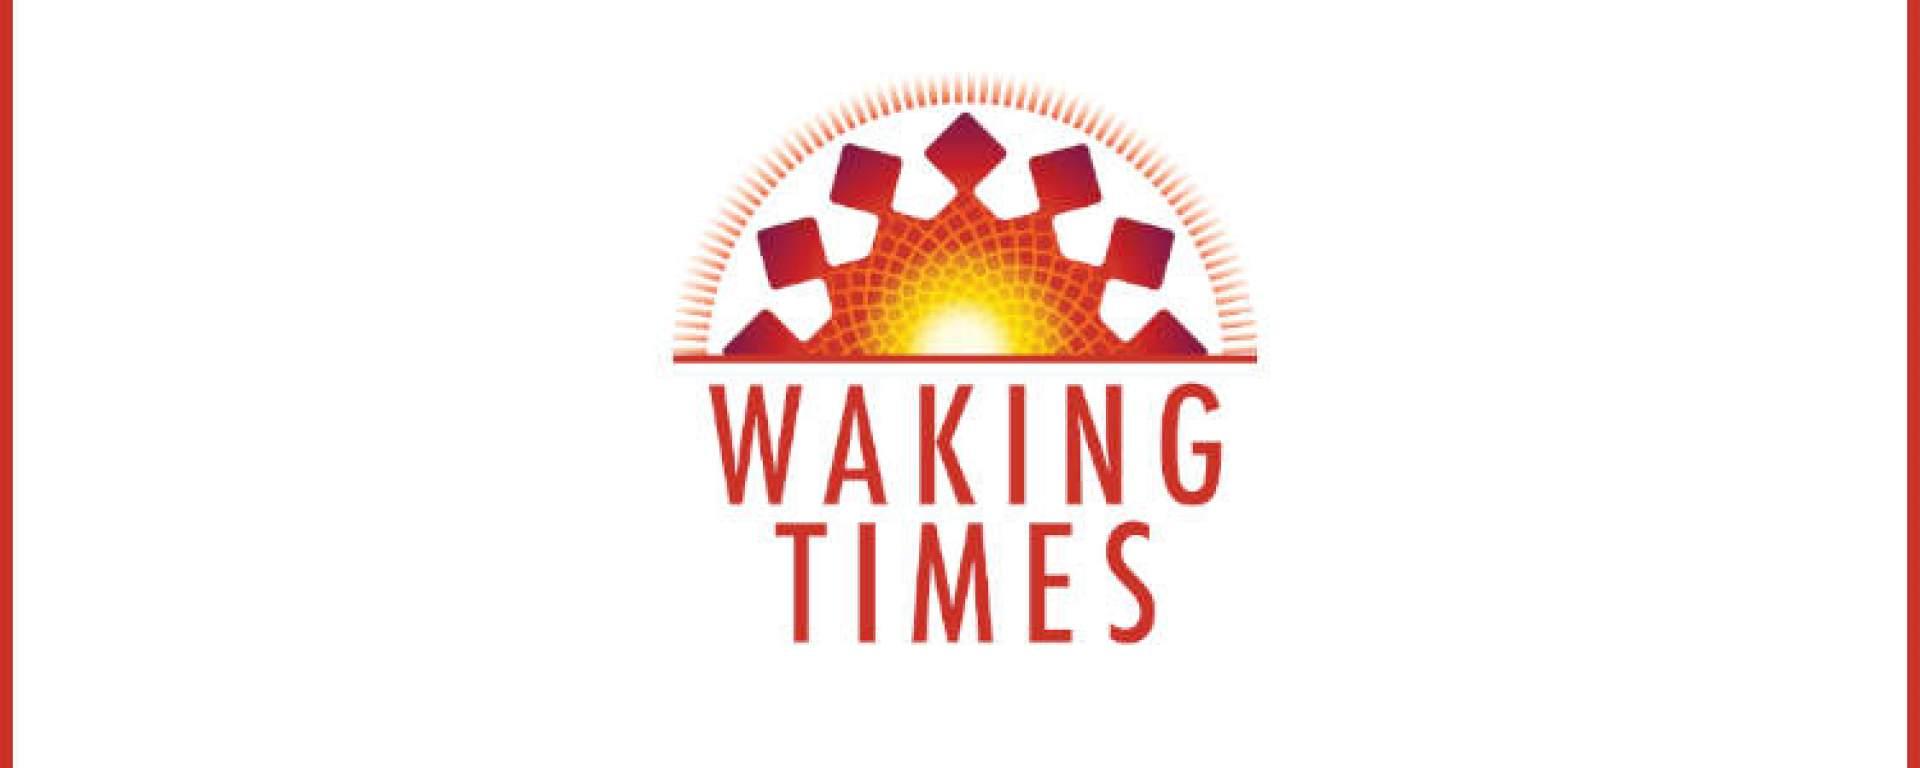 how many trees are cut down every year? – webinvestigator.kk